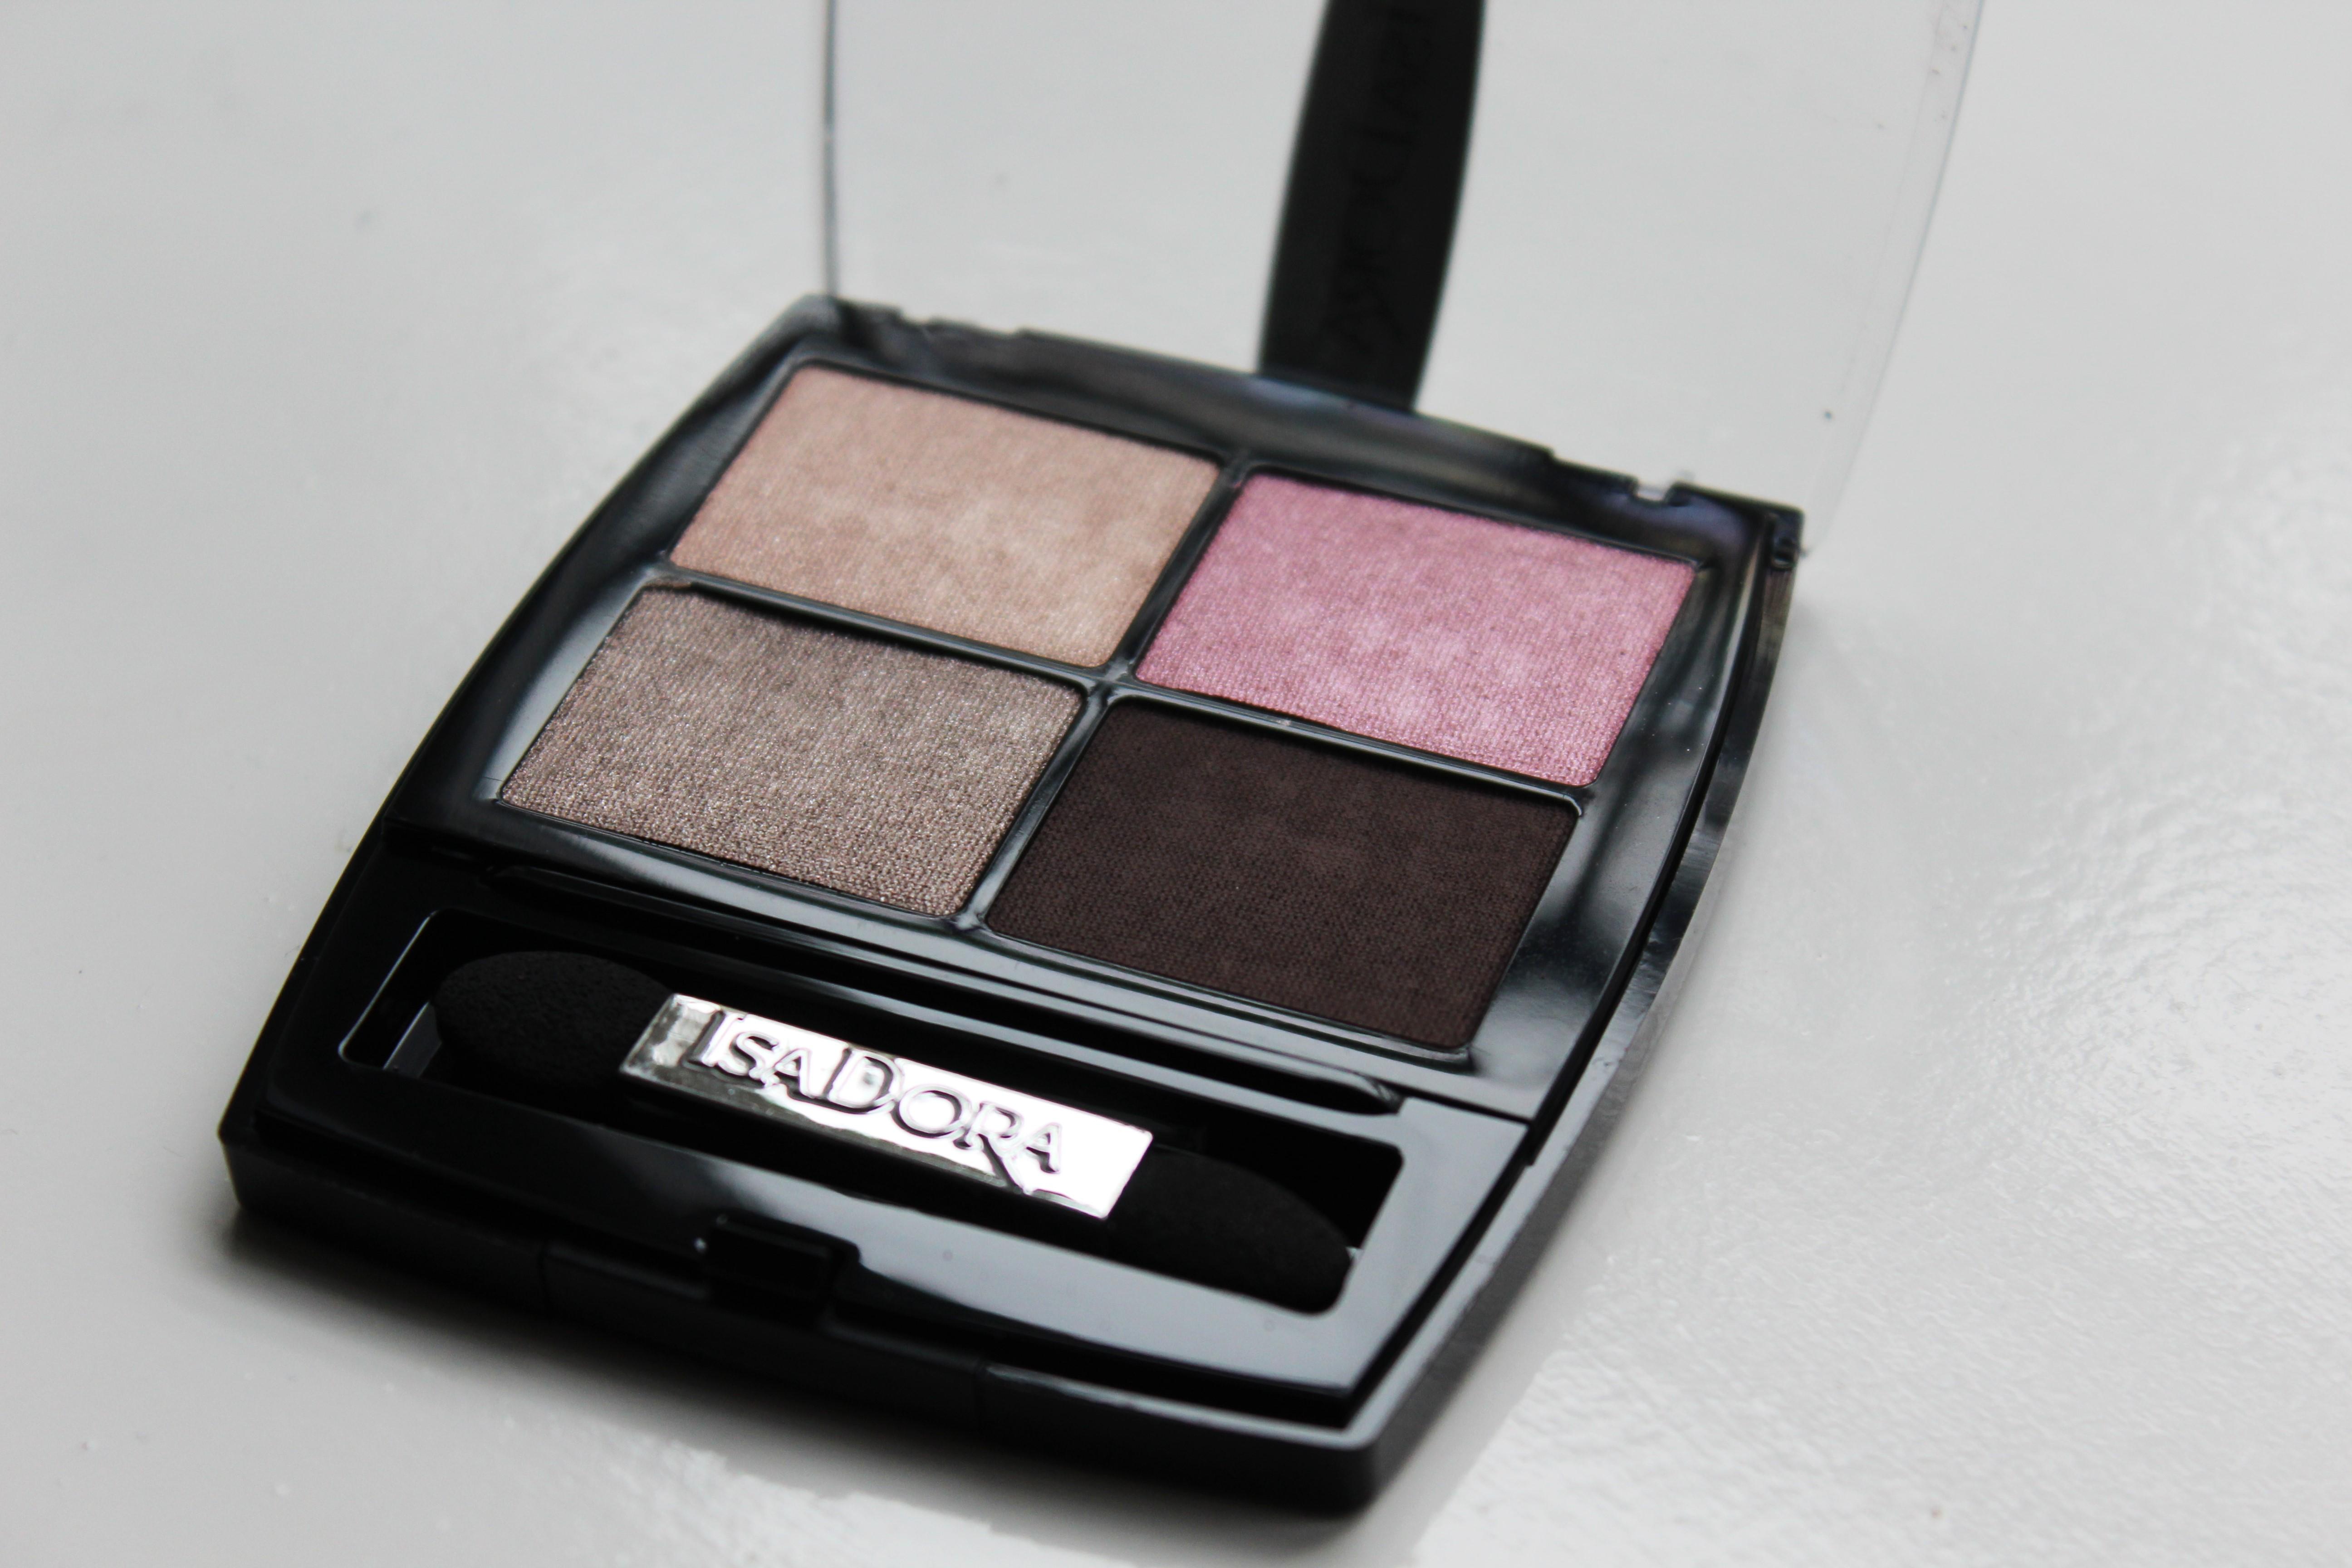 IsaDora Nude Rose 05 Eye shadow Quartet